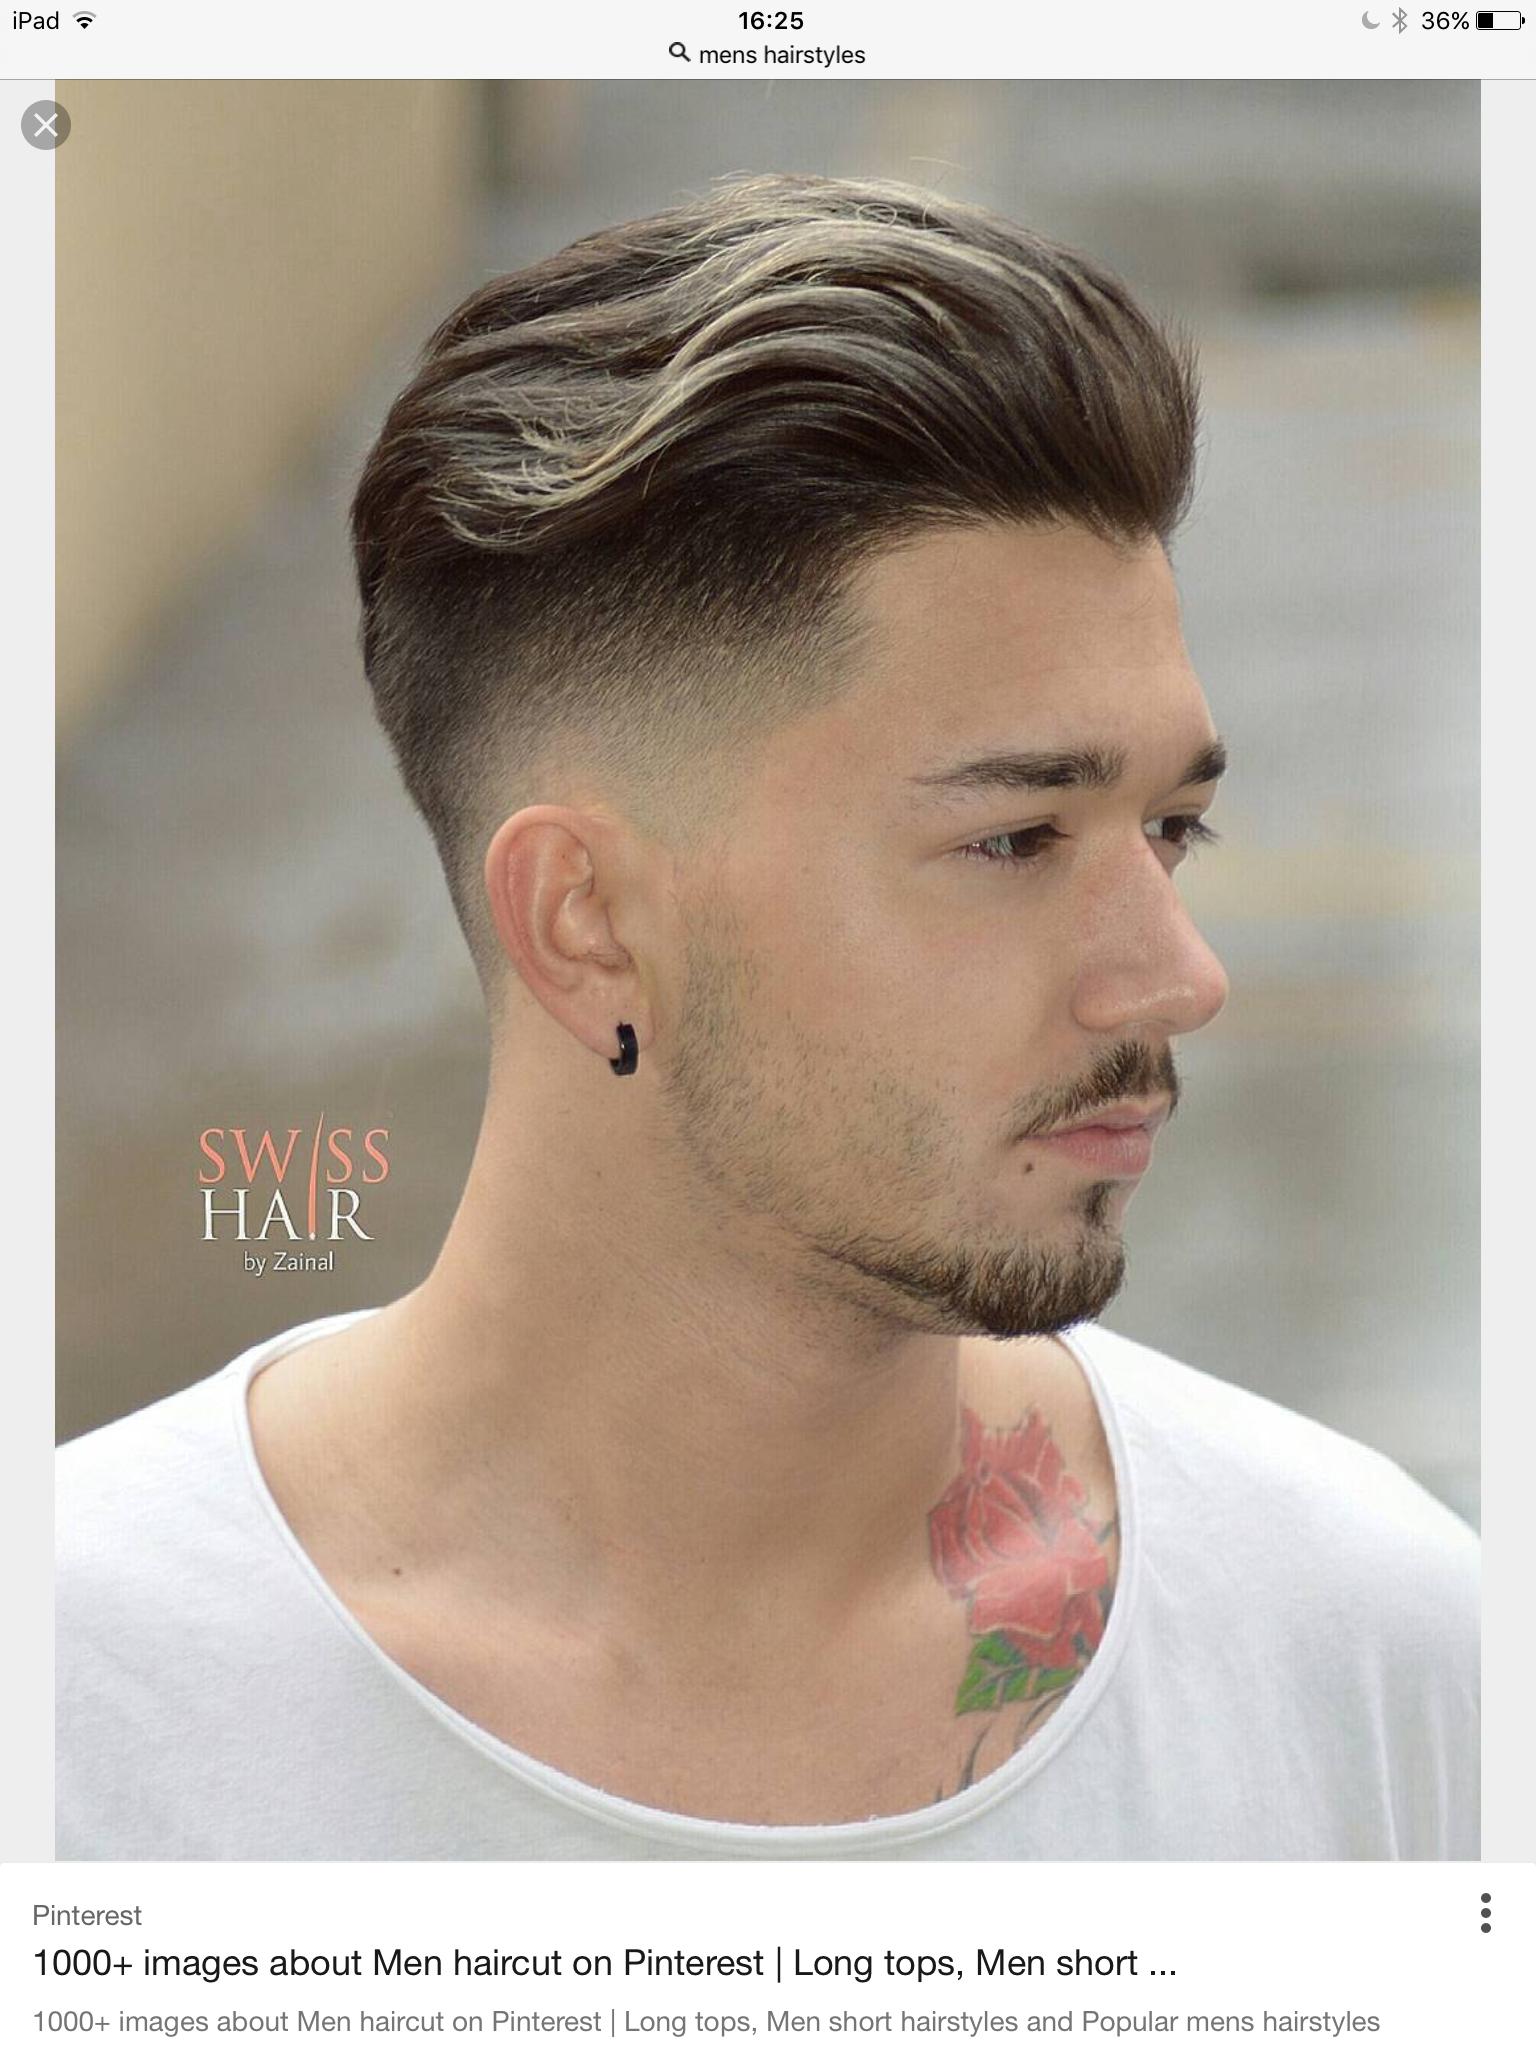 My kind of man s haircut